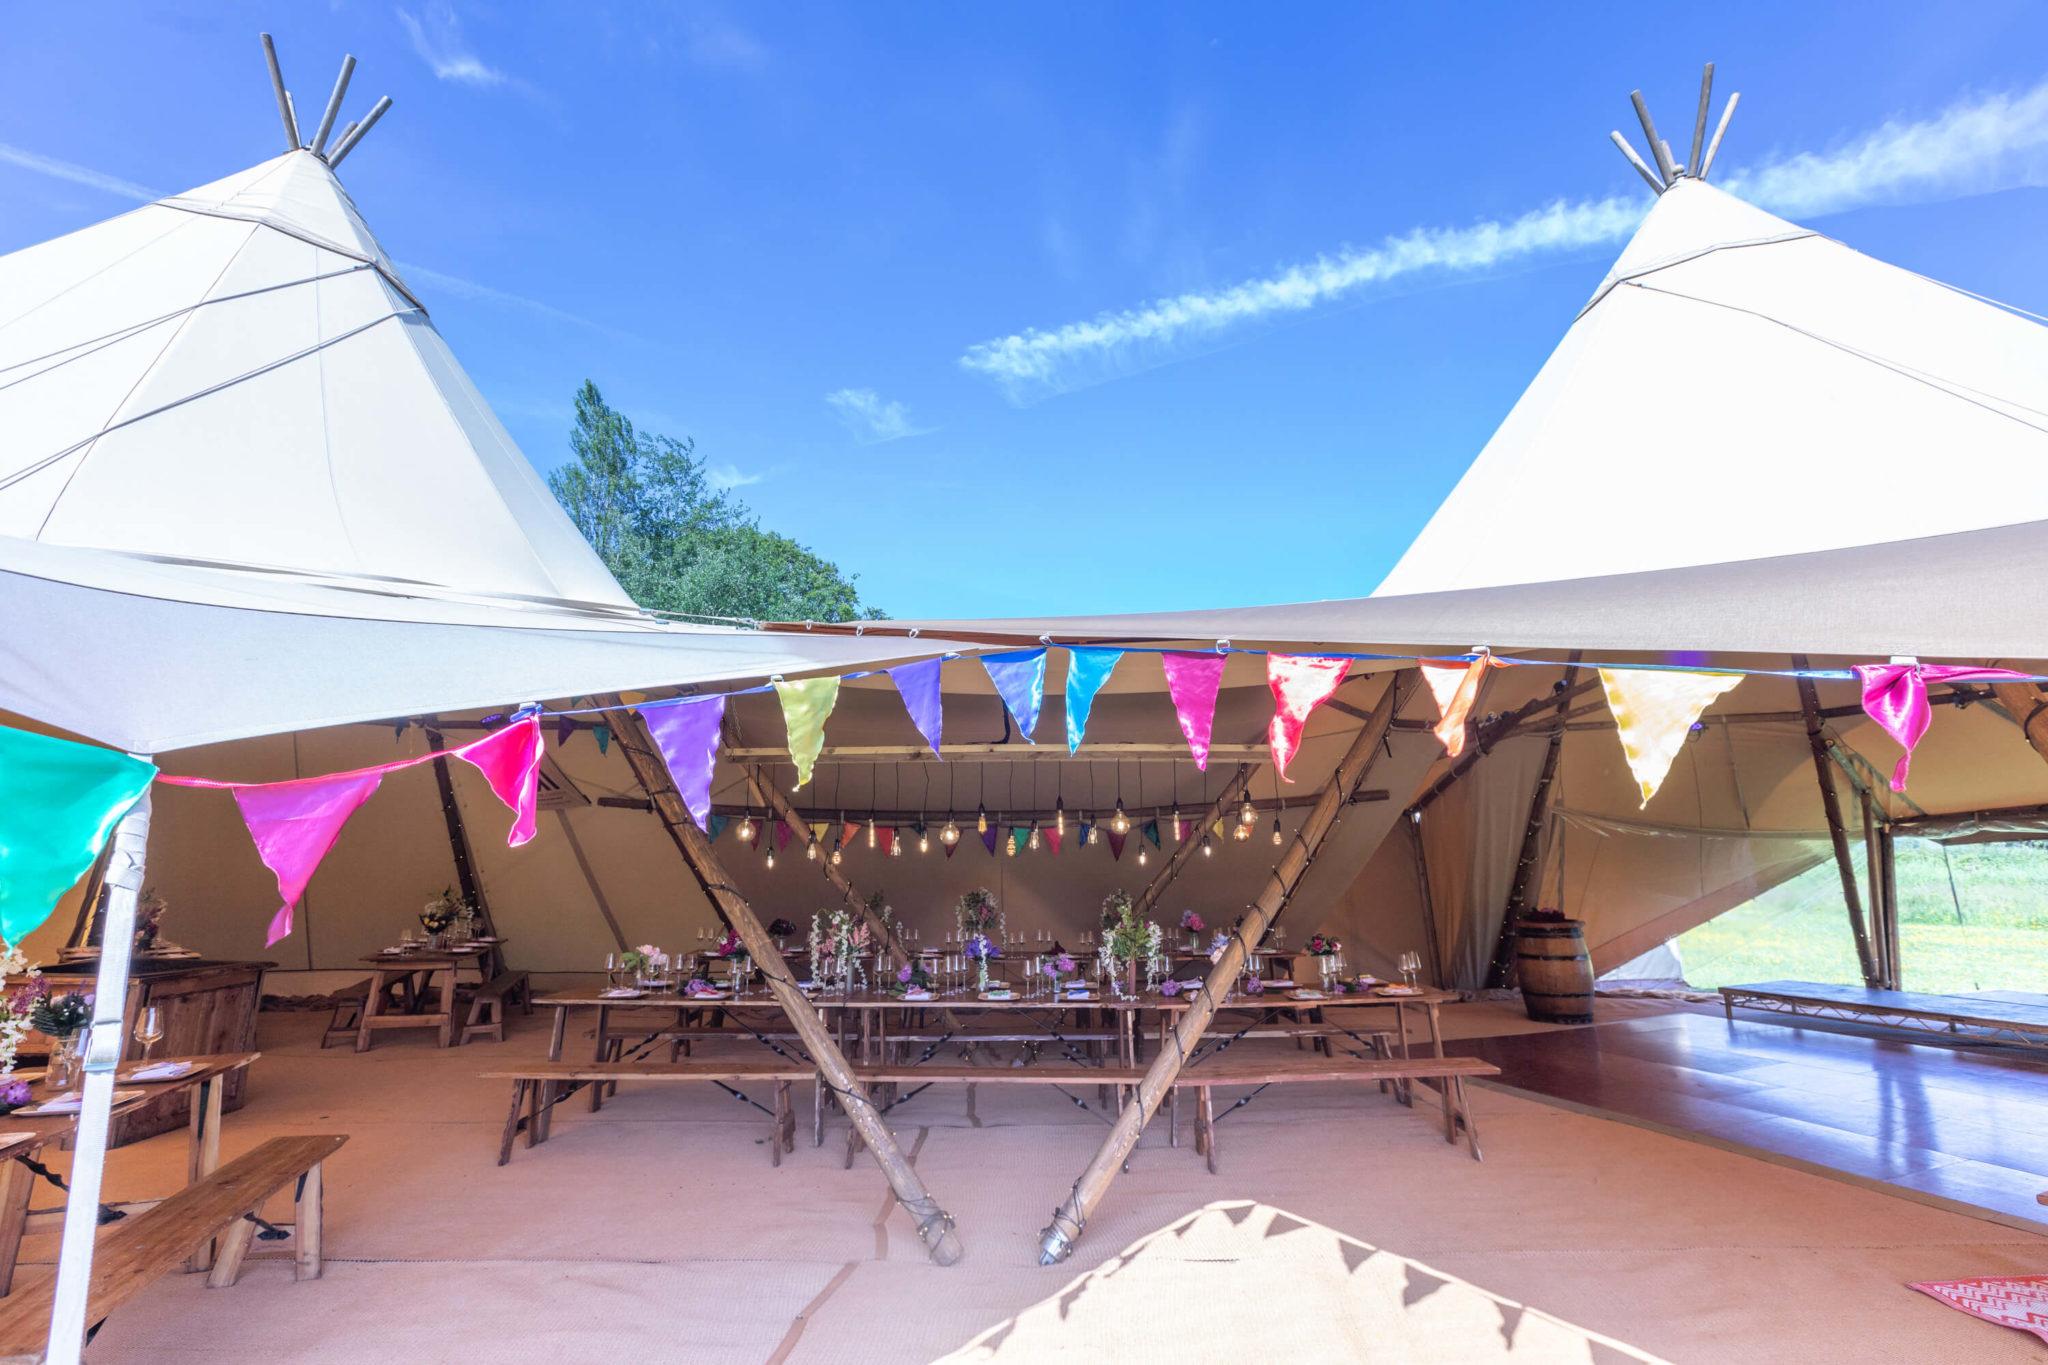 wedding tipi tent